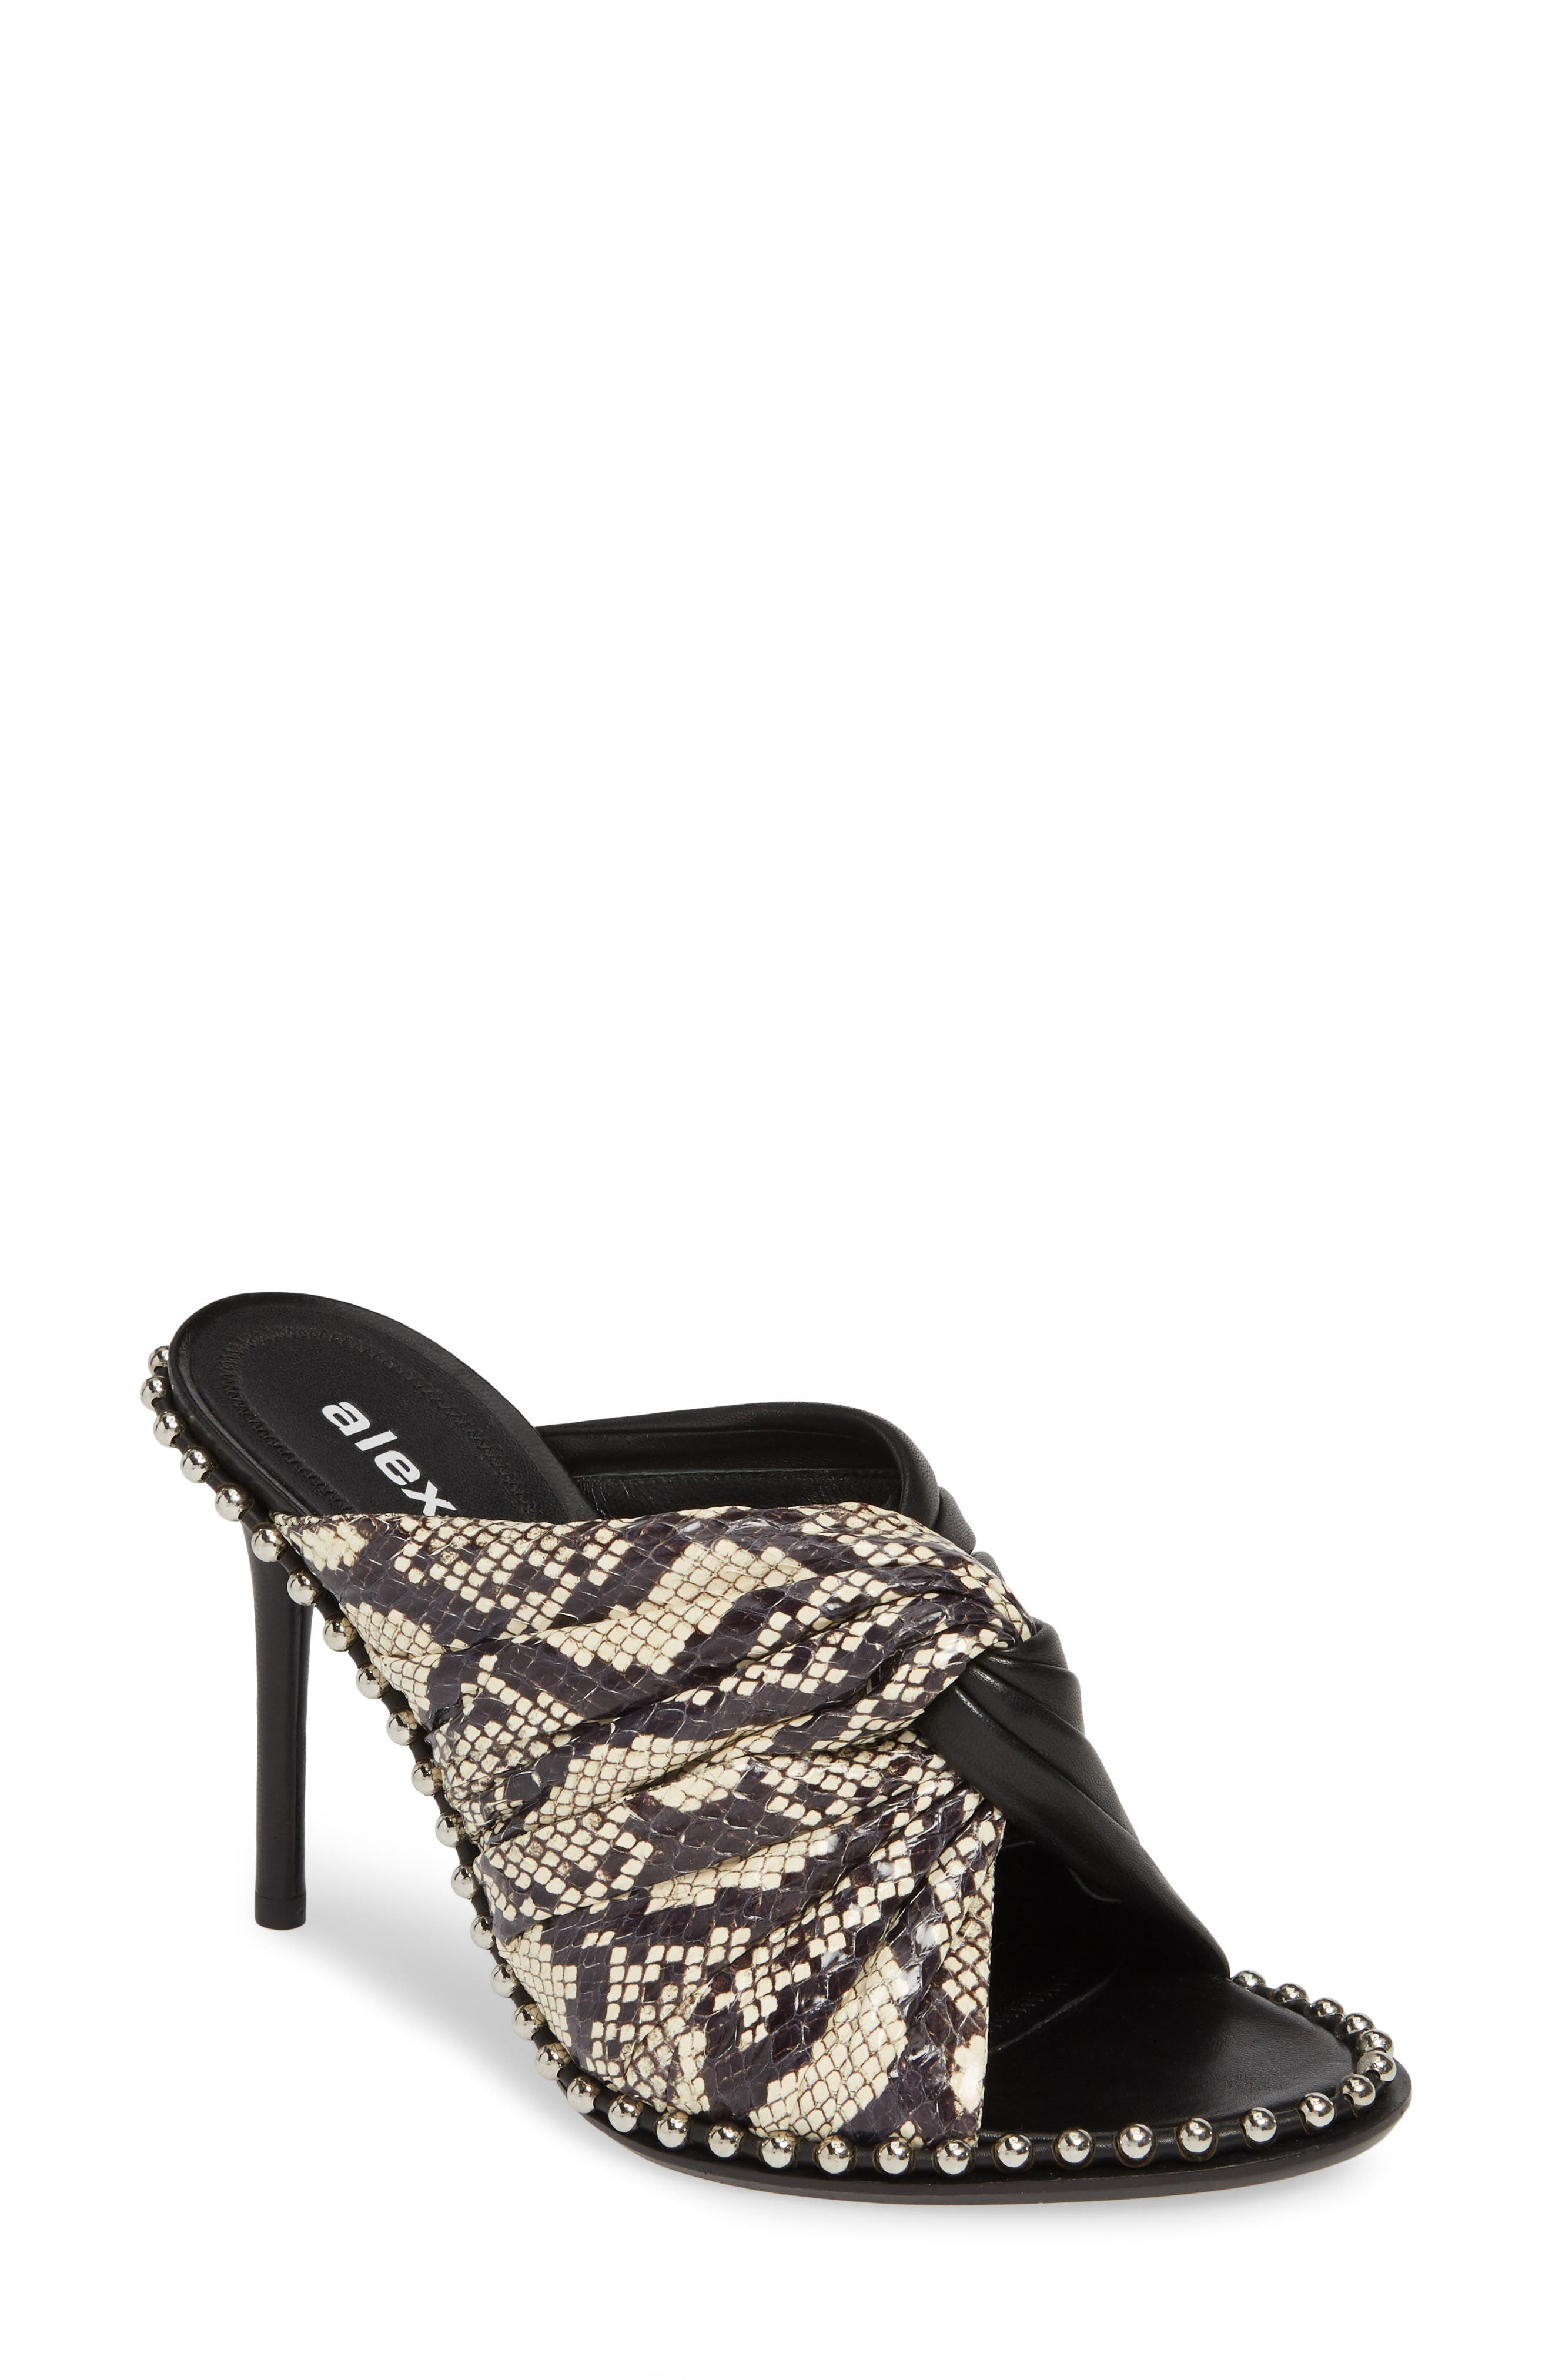 Alexander Wang Lily Genuine Snakeskin & Lambskin Leather Sandal, White